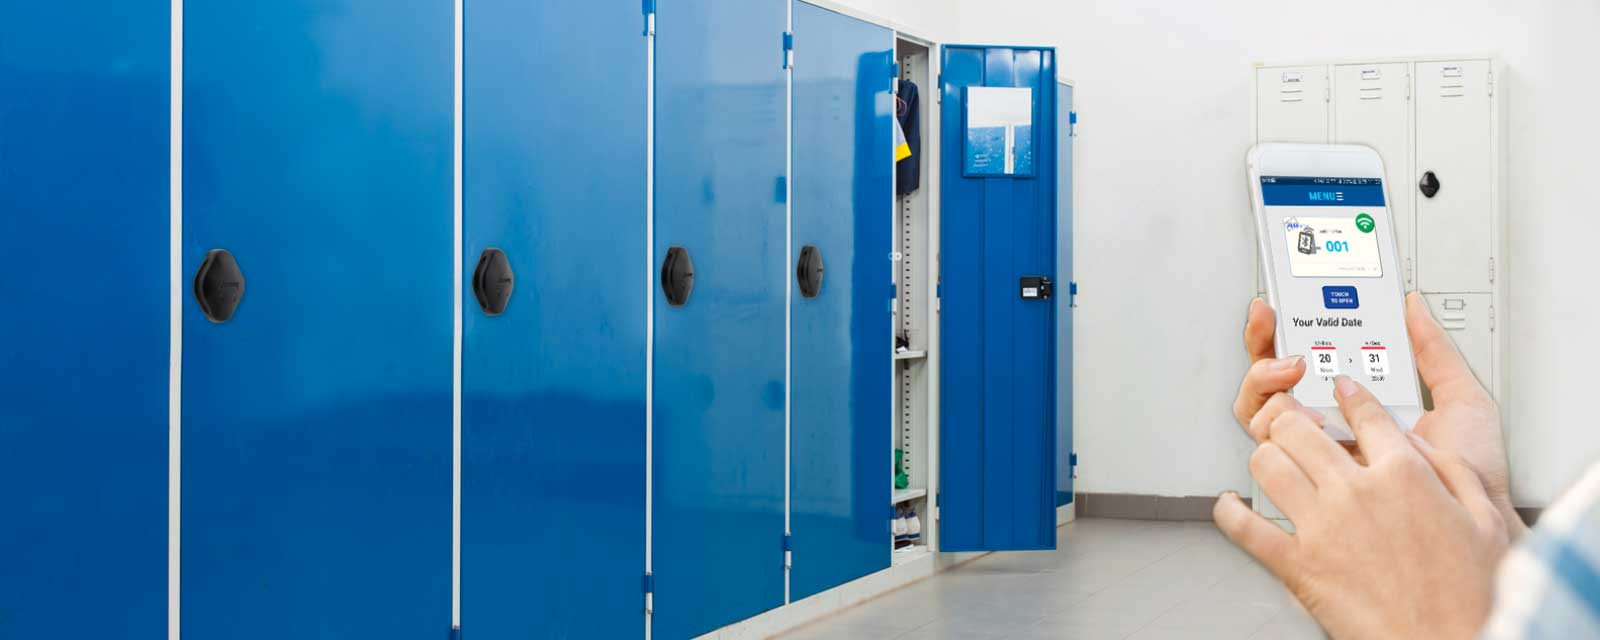 ViAge Solutions – Smart RFID Locker Locks